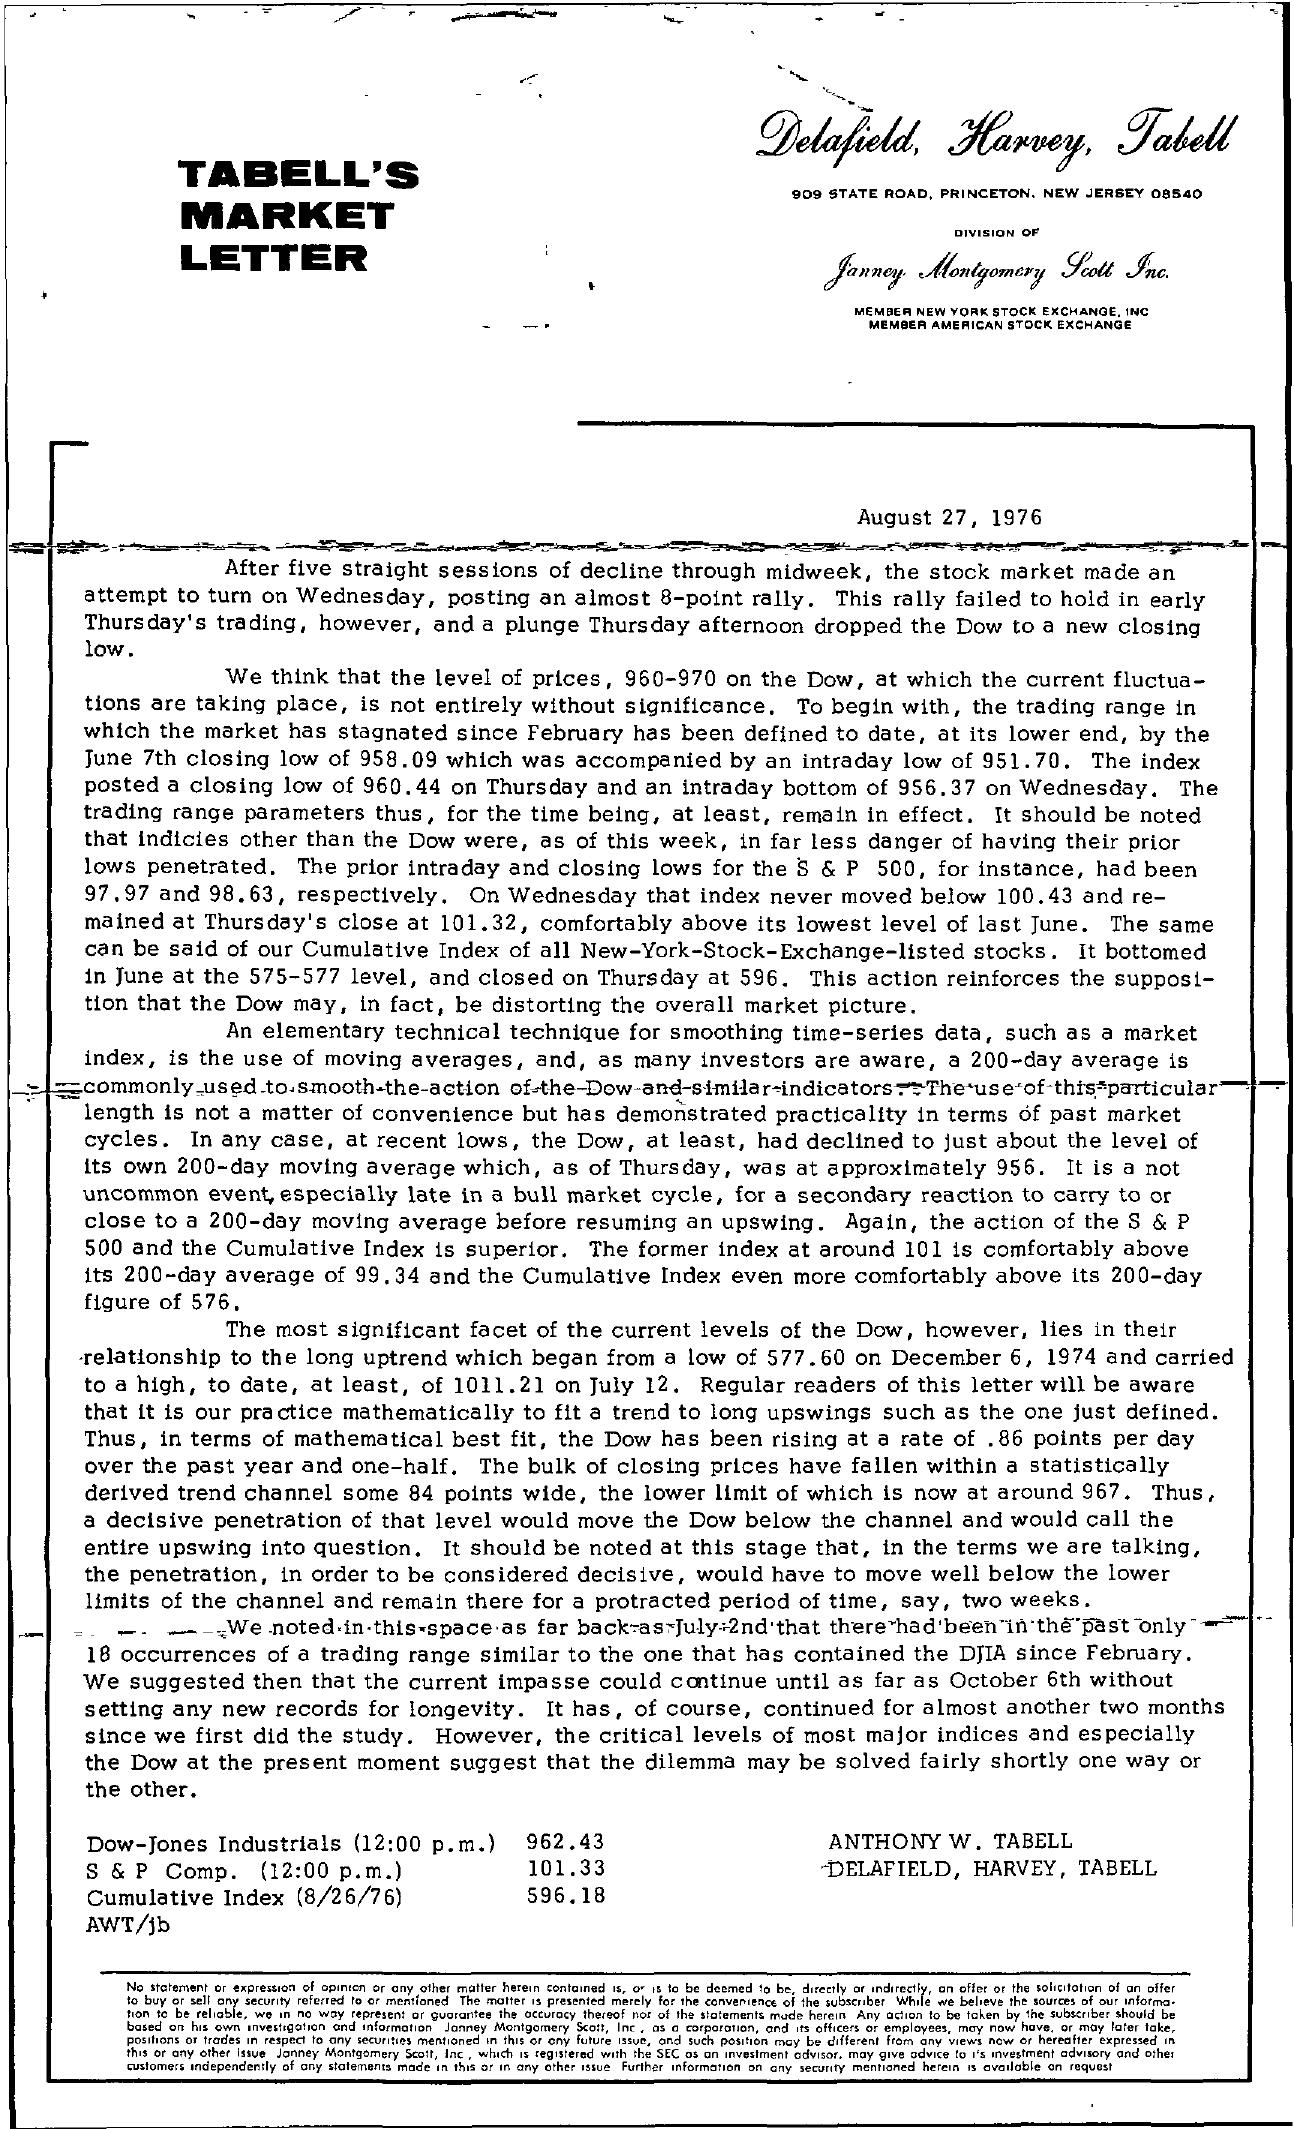 Tabell's Market Letter - August 27, 1976